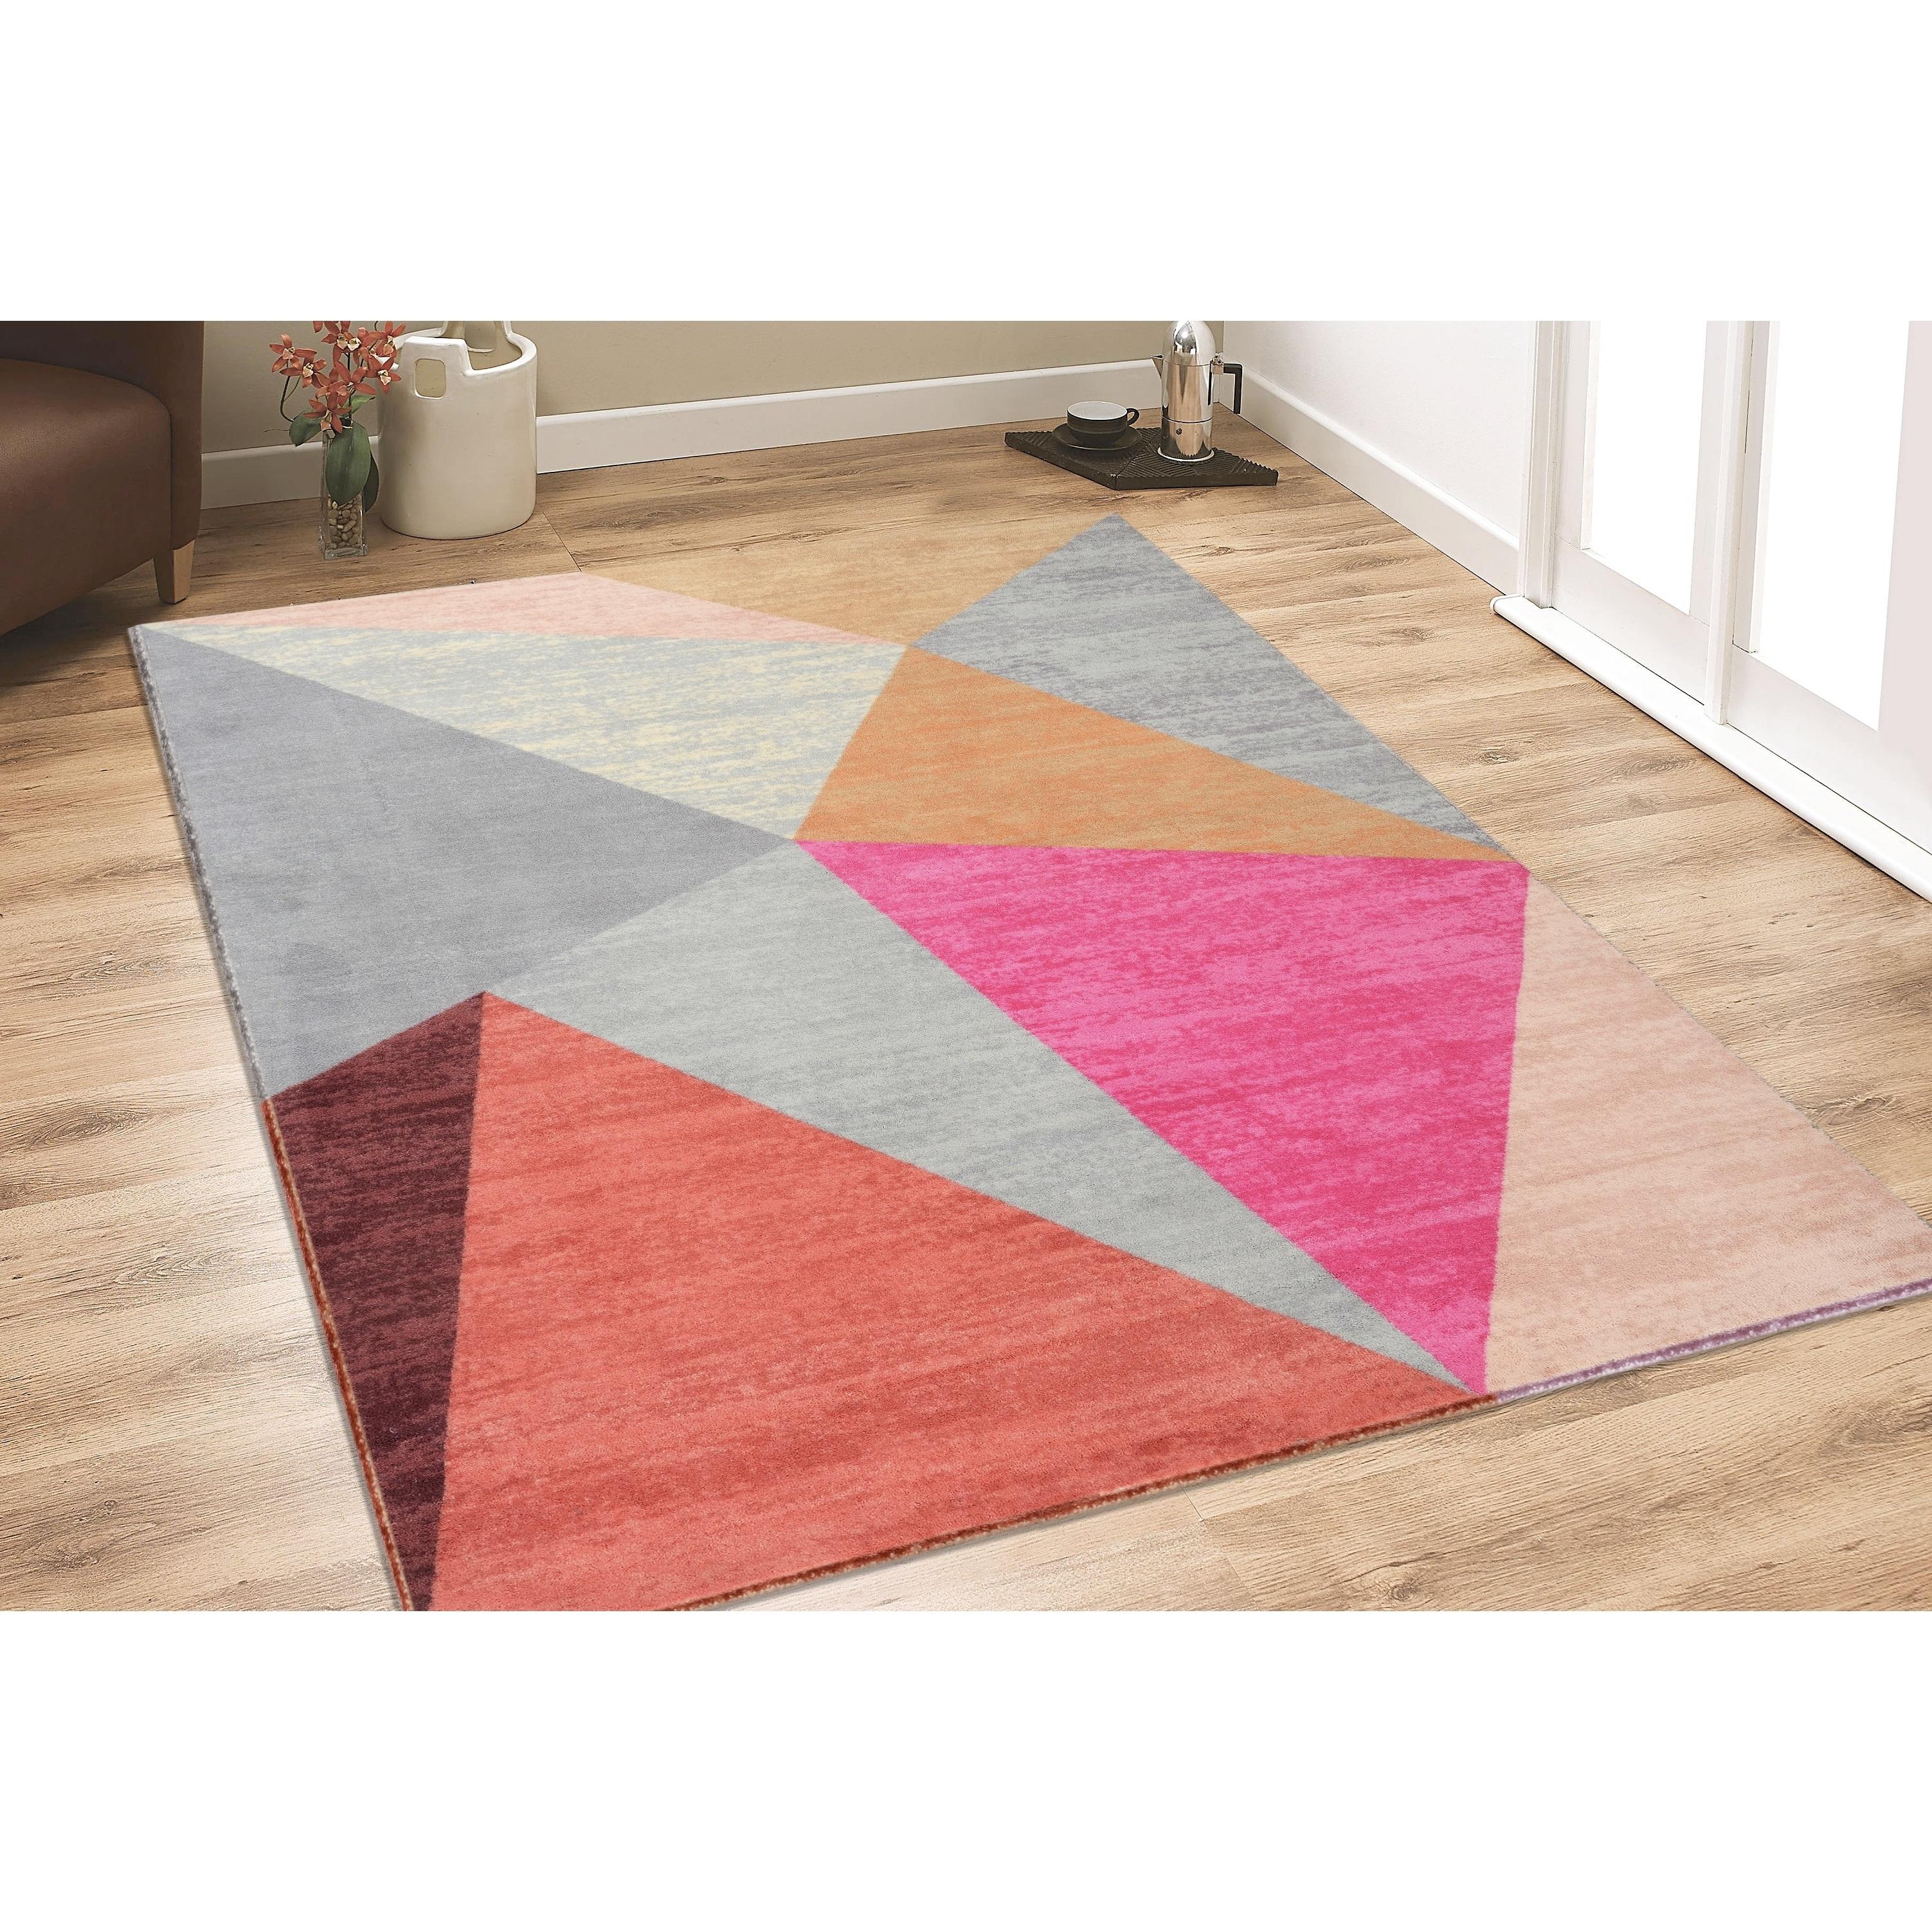 RugSmith Pink Pyramid Mid-Century Geometric Area Rug - 3 x 5 (3 x 5 - Pink)